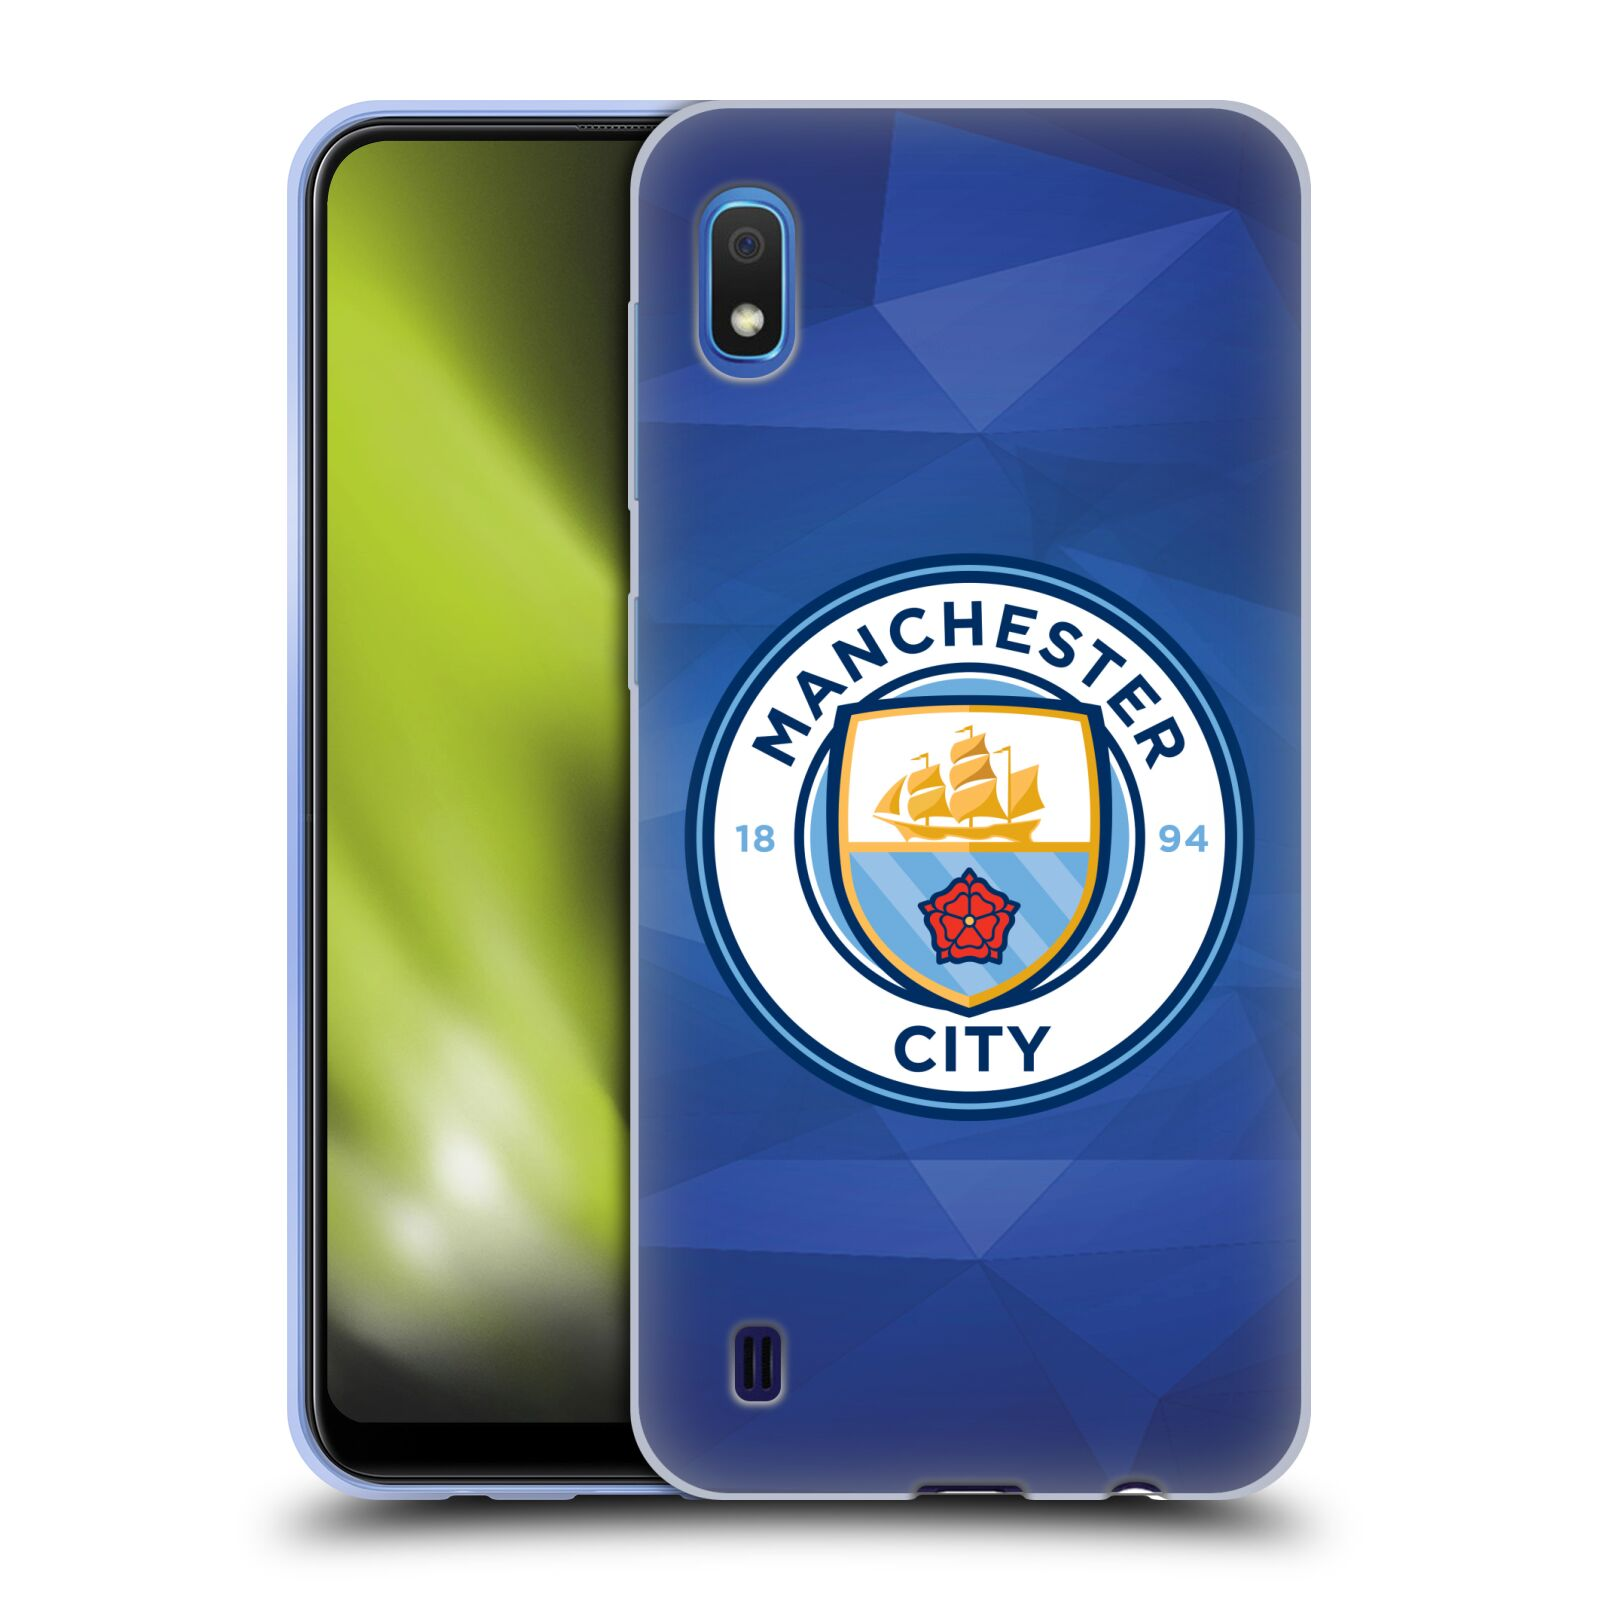 Silikonové pouzdro na mobil Samsung Galaxy A10 - Head Case - Manchester City FC - Modré nové logo